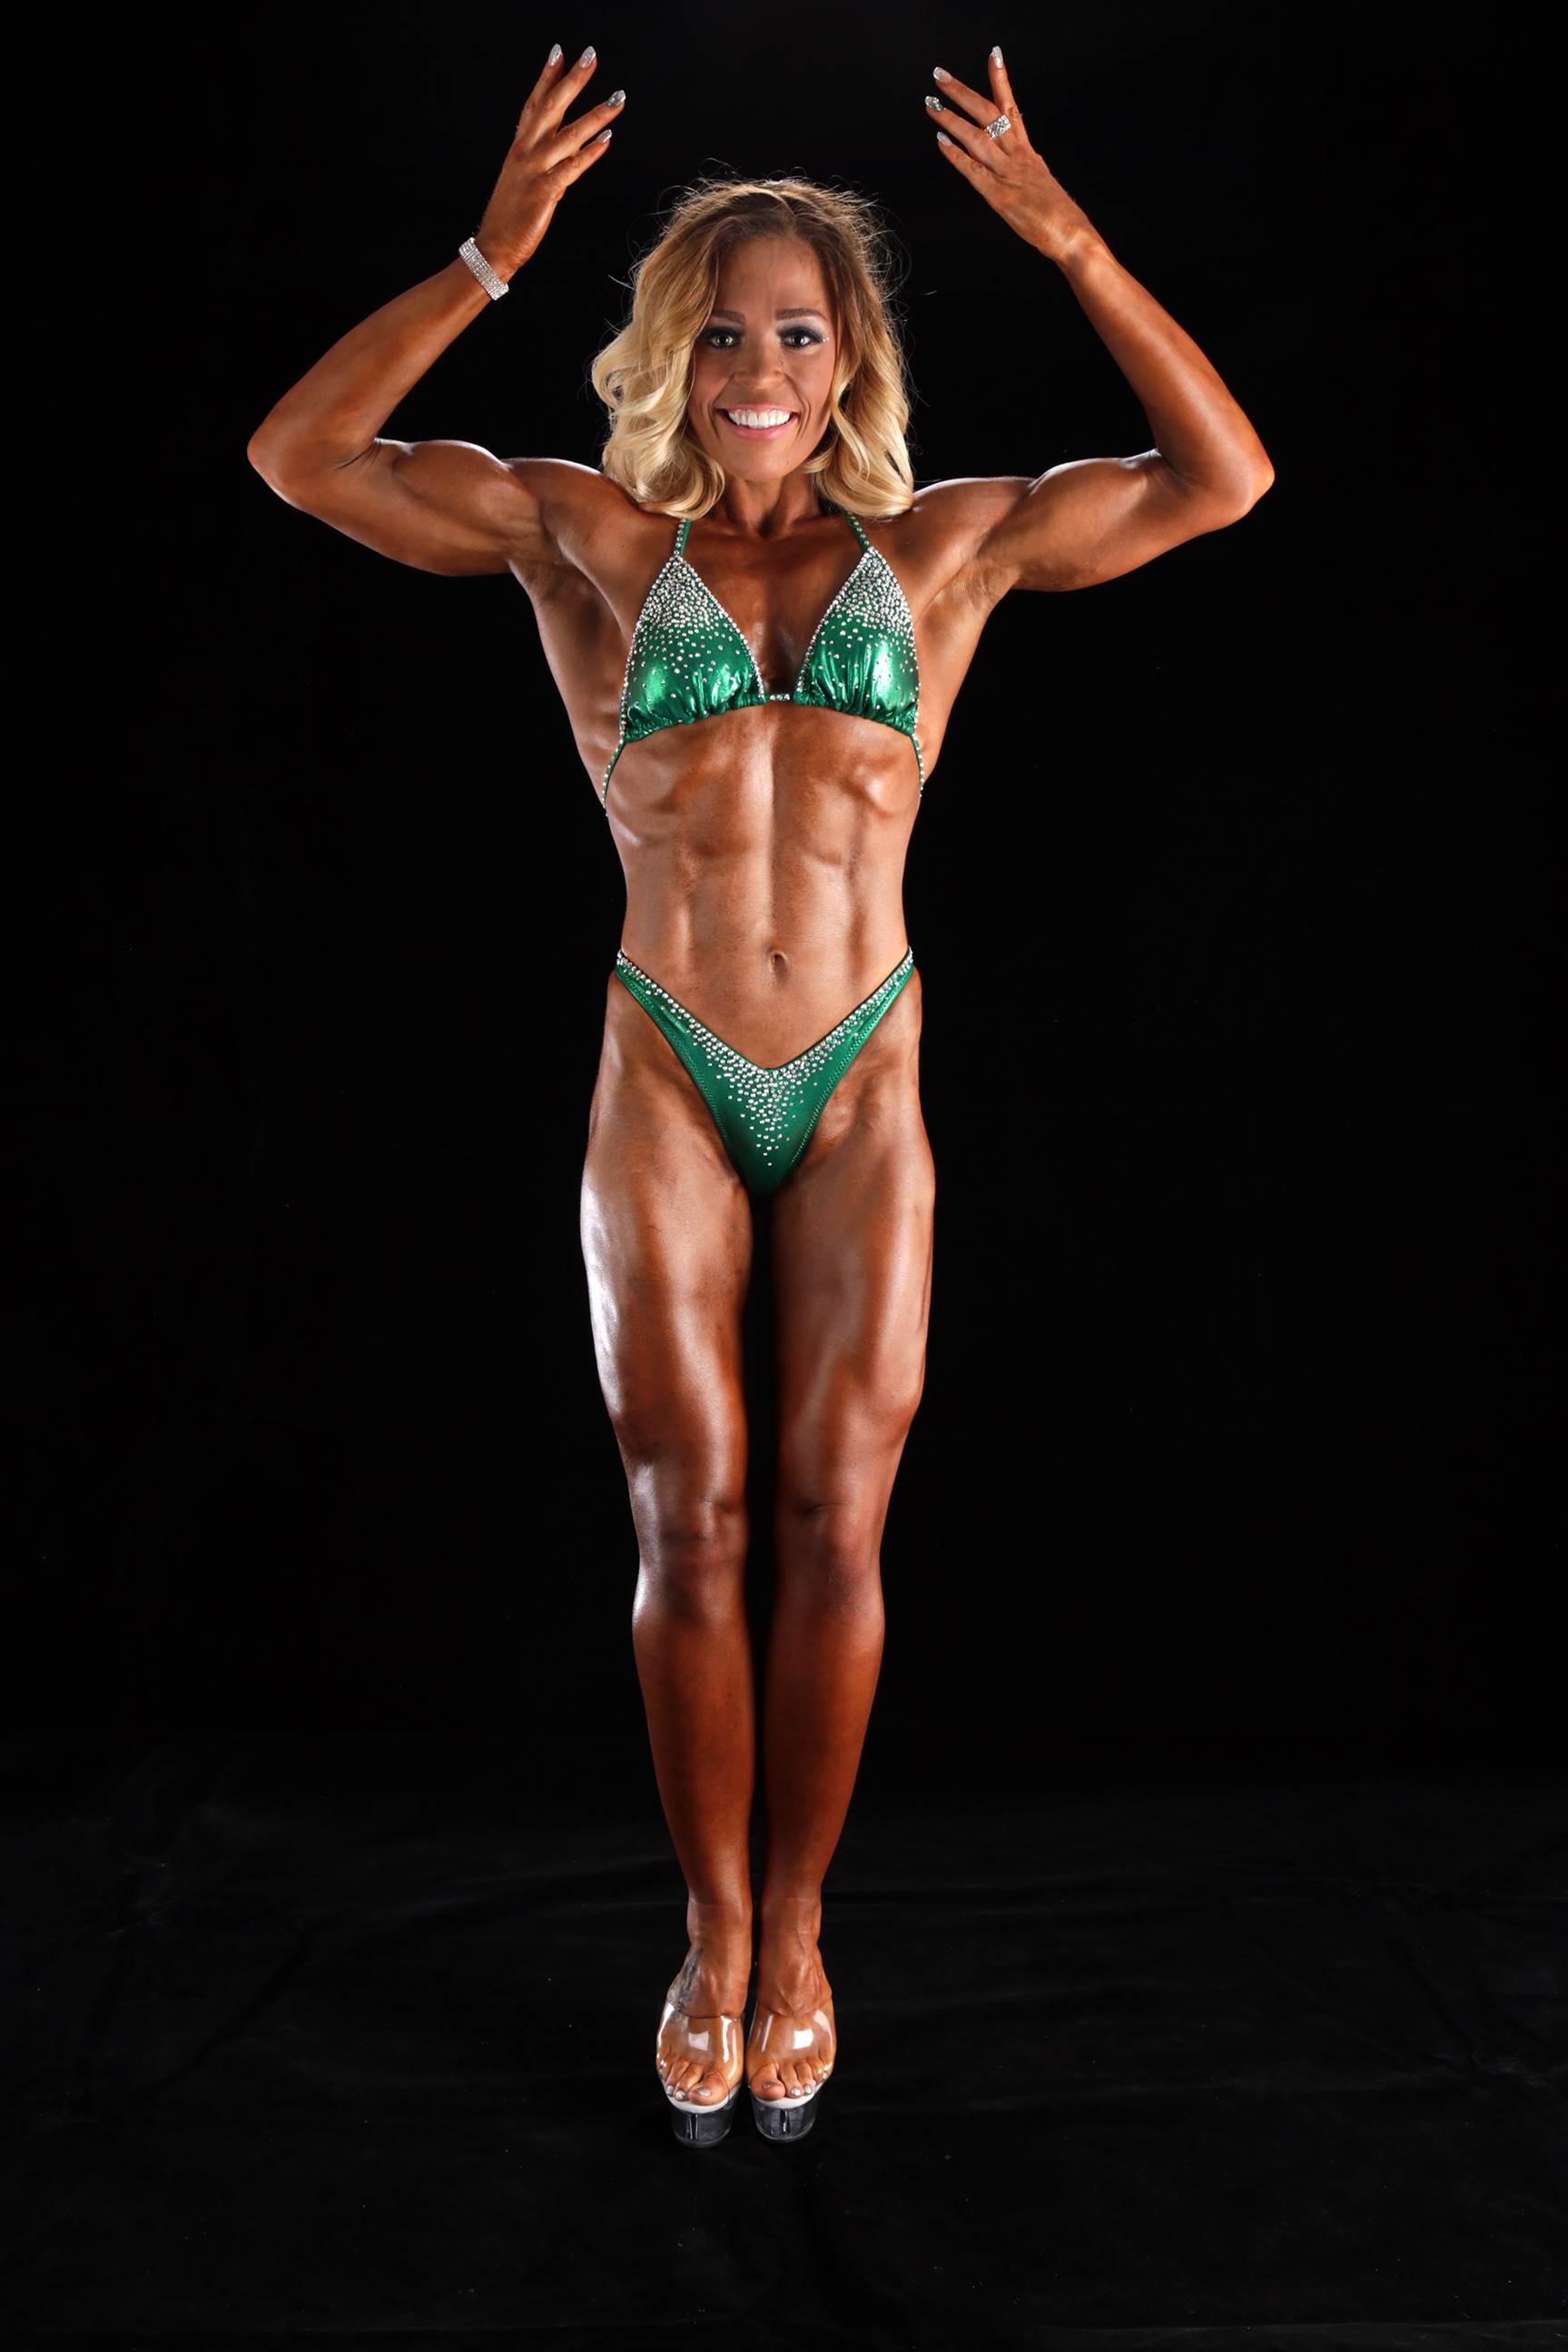 2015 NABBA/WFF Lee Priest Classic - Women (Download) - GMV Bodybuilding